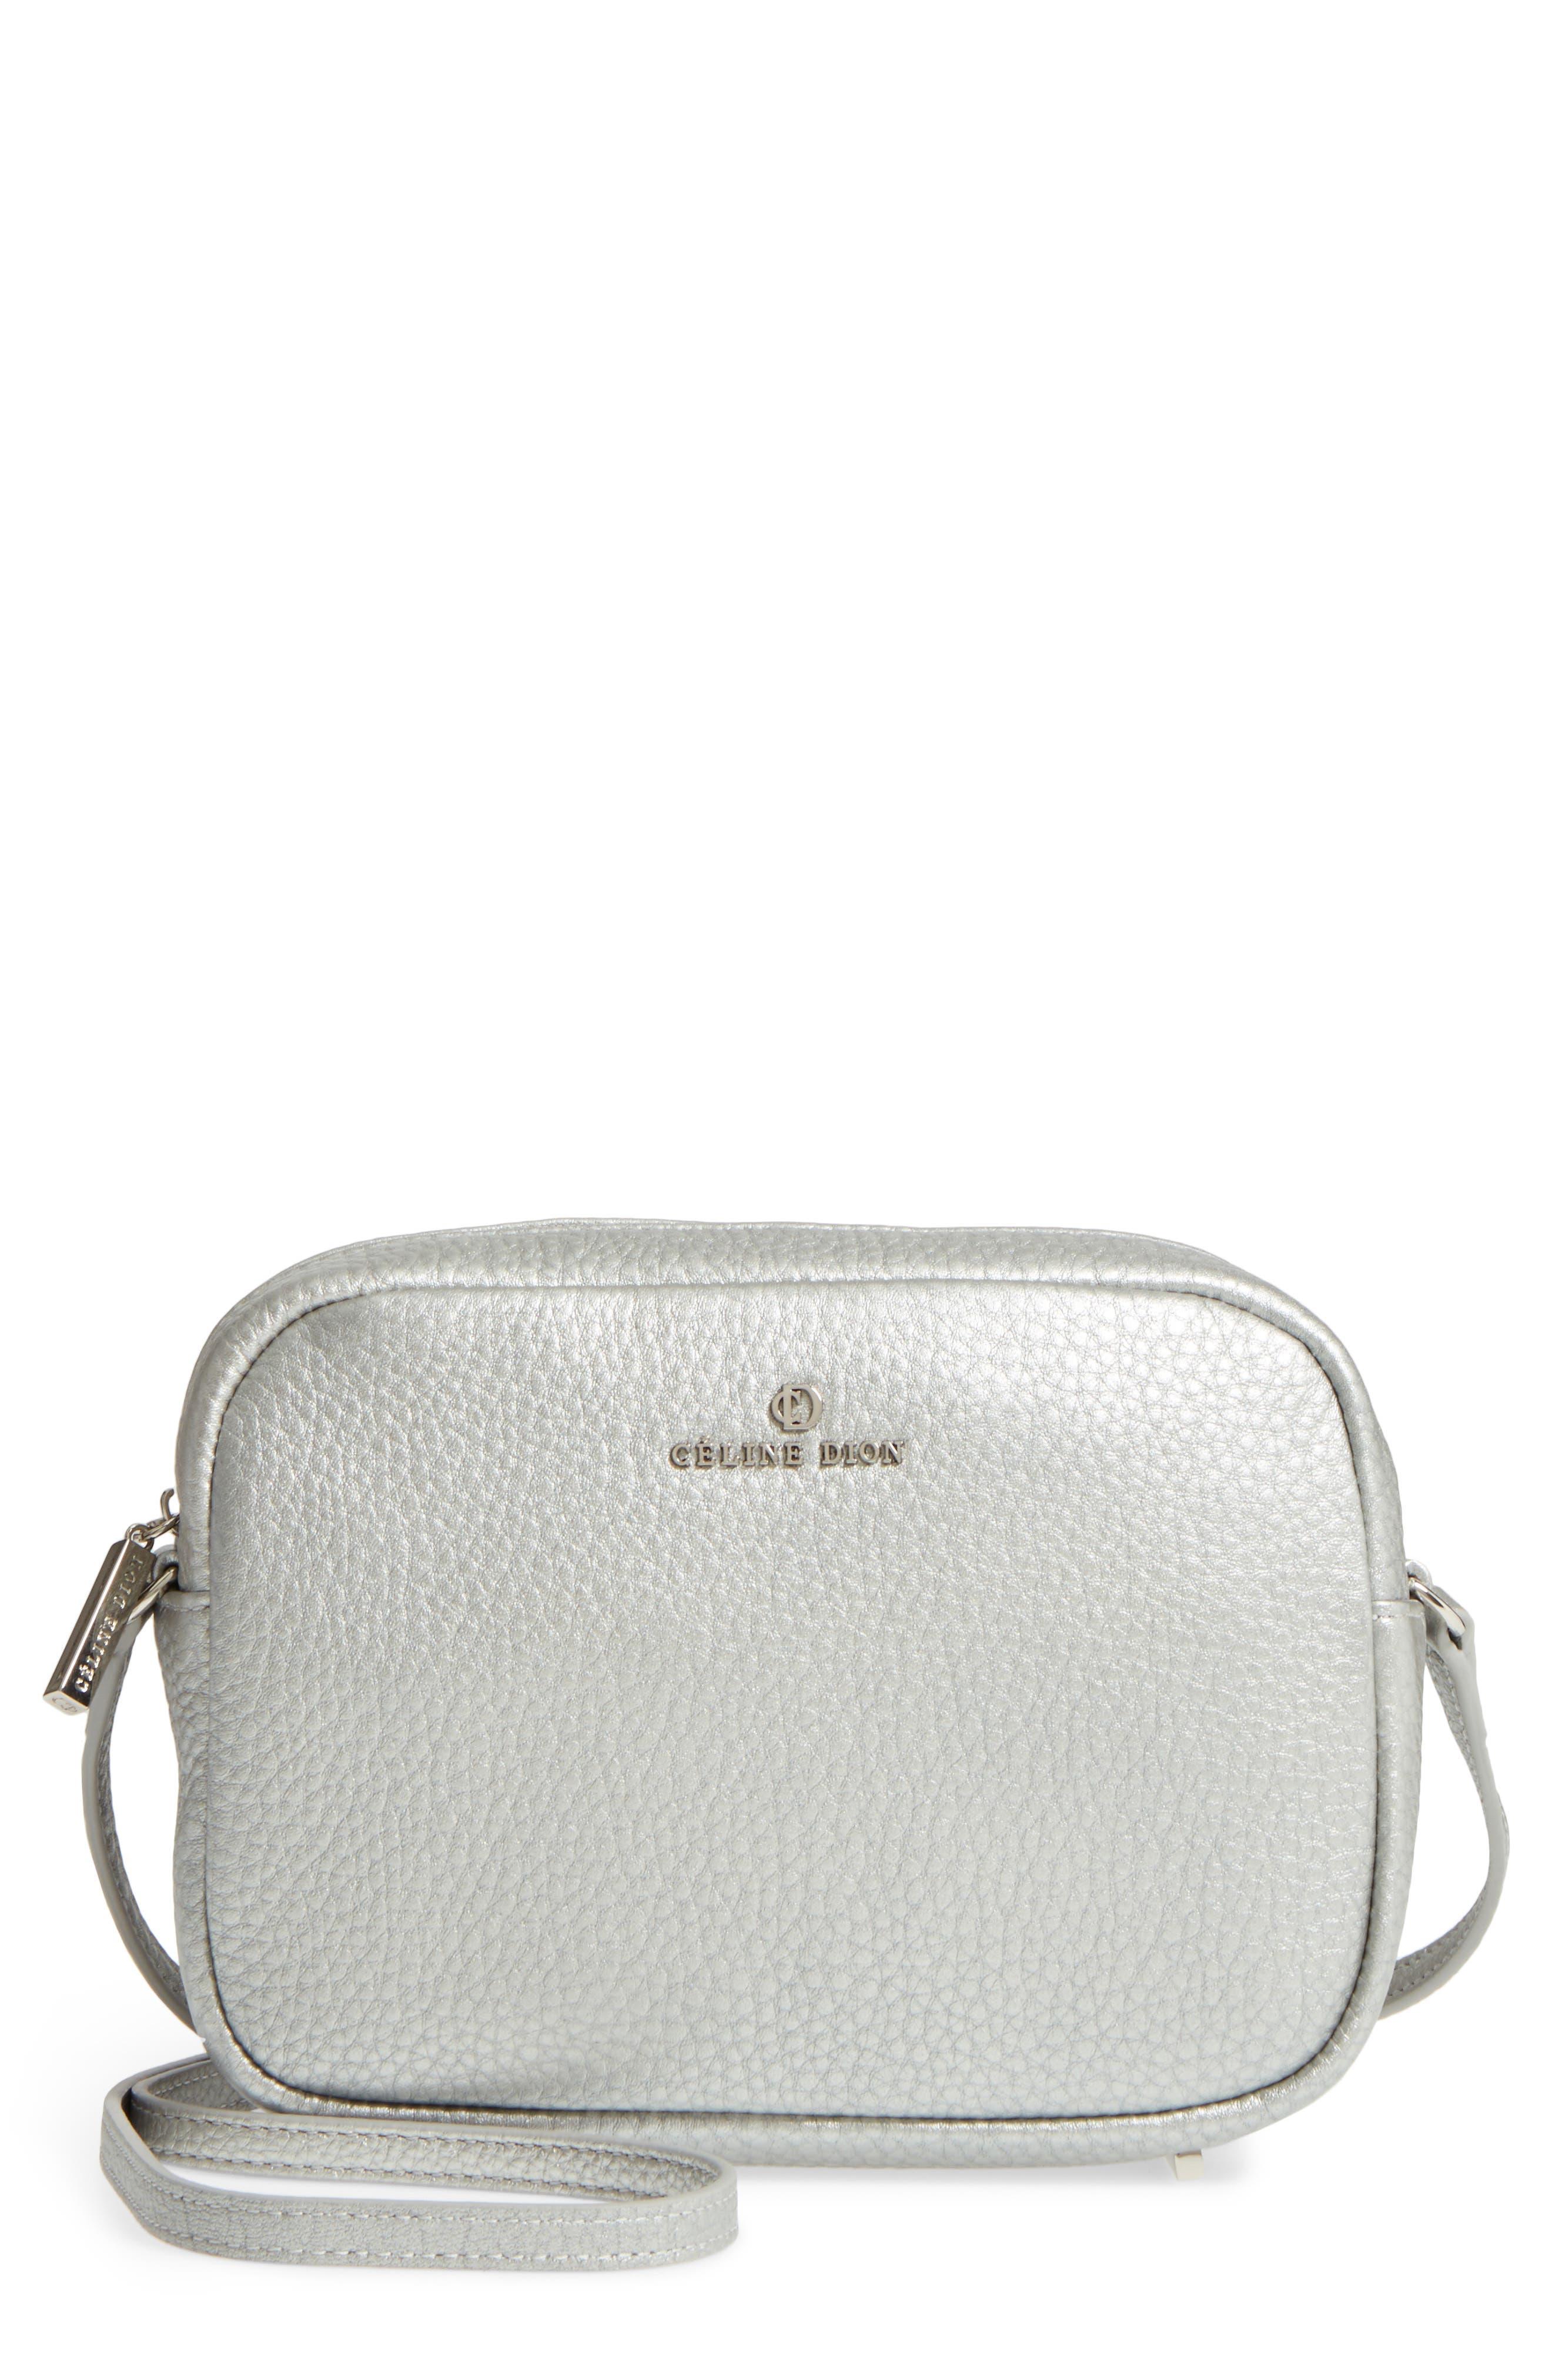 Céline Dion Adagio Leather Camera Crossbody Bag,                             Main thumbnail 2, color,